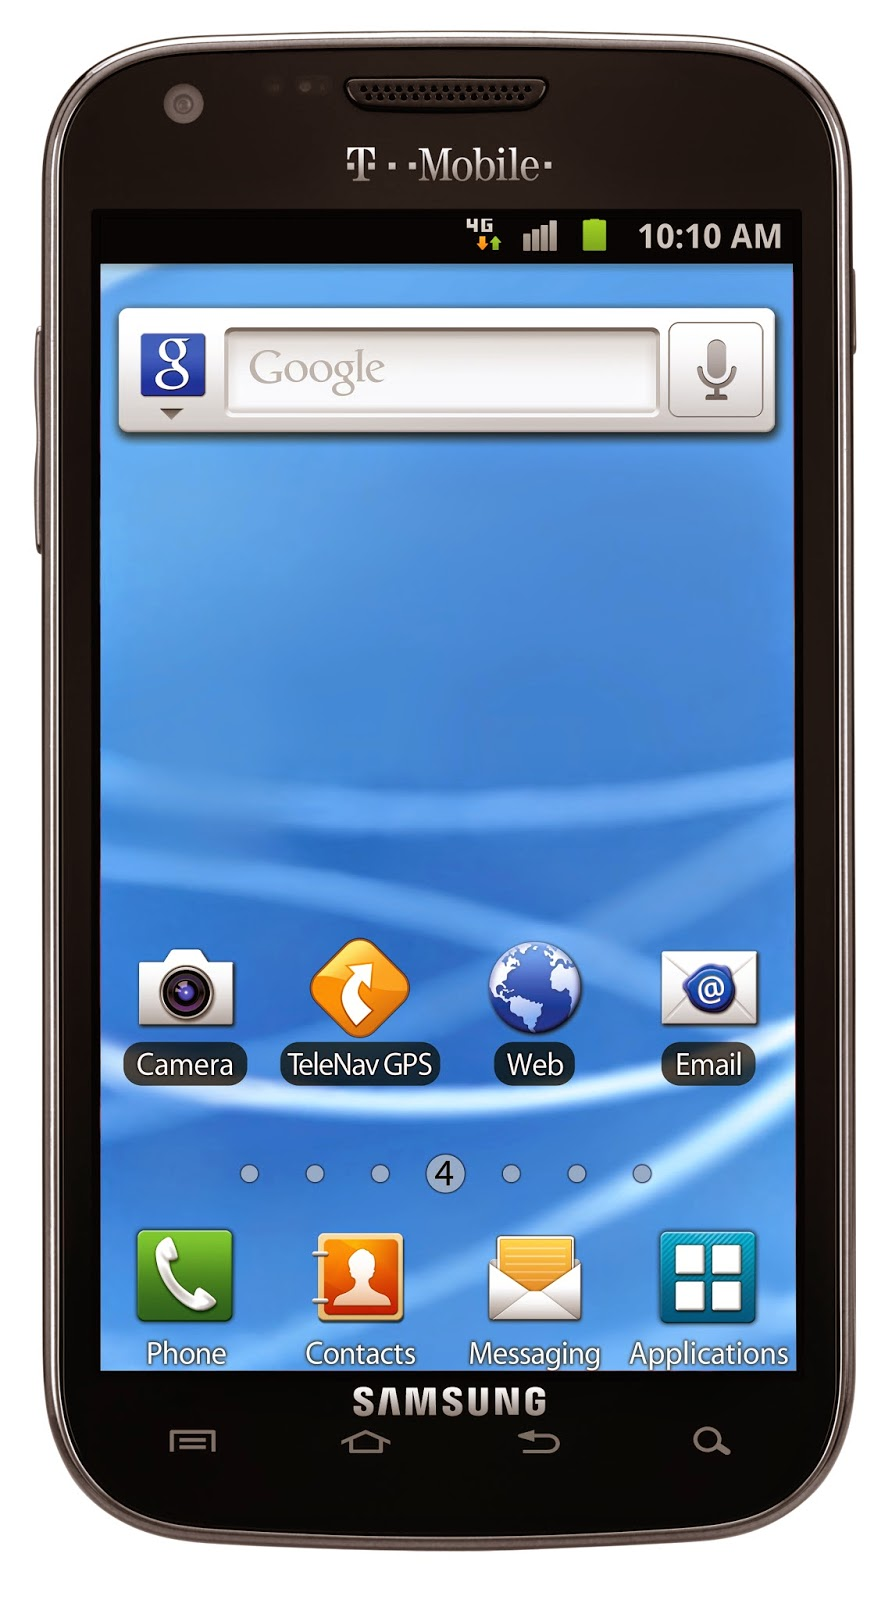 Программы На Samsung Android 2.2